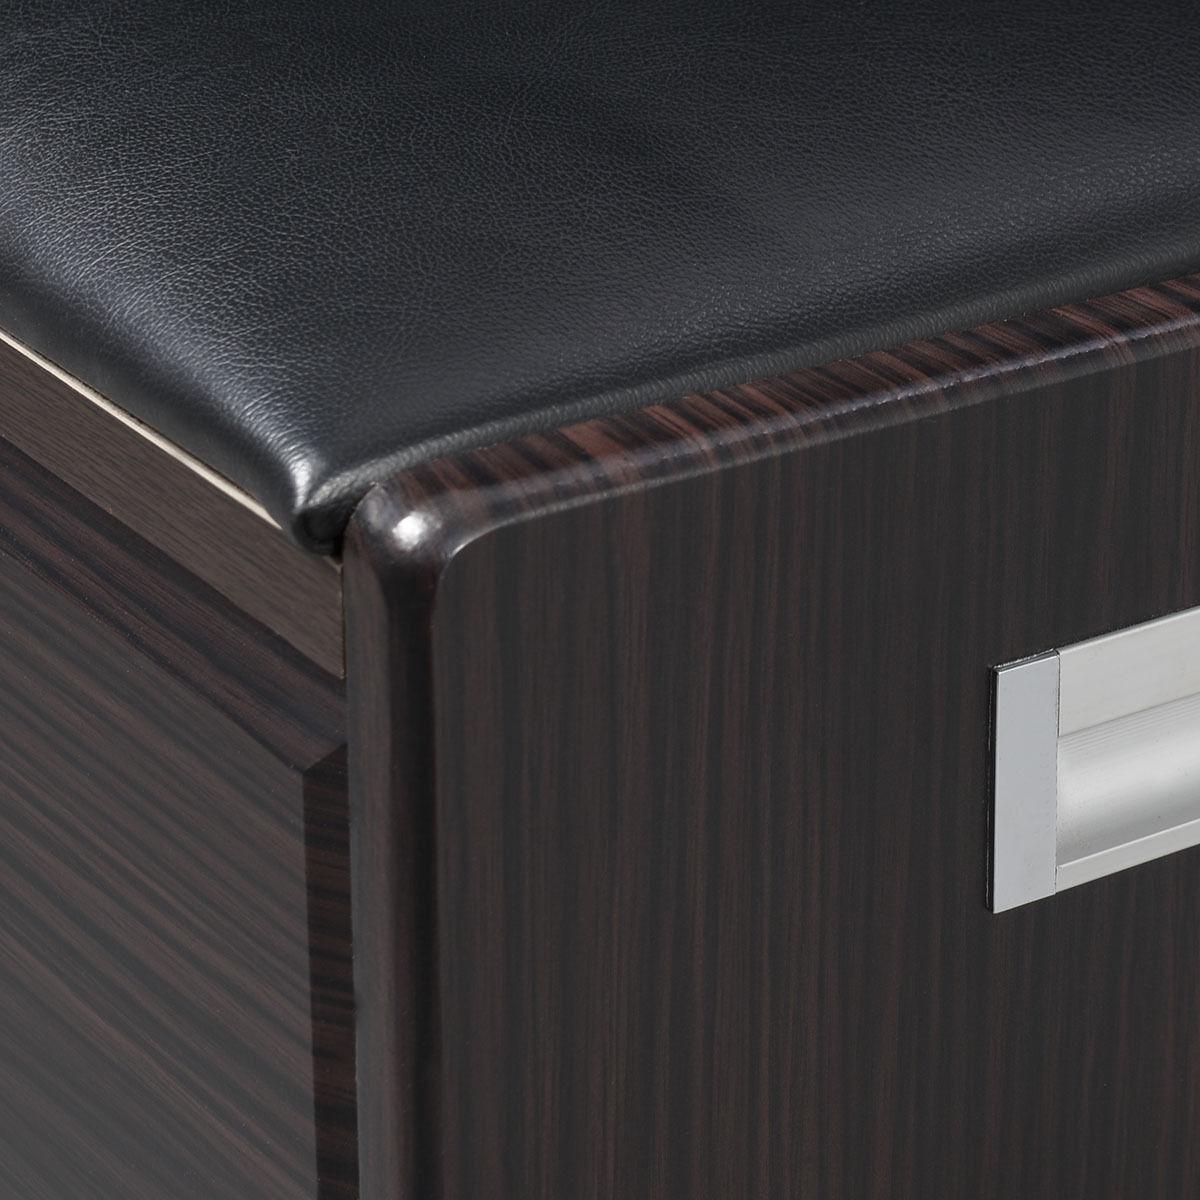 Giantex Wood Shoe Storage Ottoman Bench Modern Shoes Cabinet Closet Shelf  Entryway Multipurpose Pouffe Stool Hw49316bk